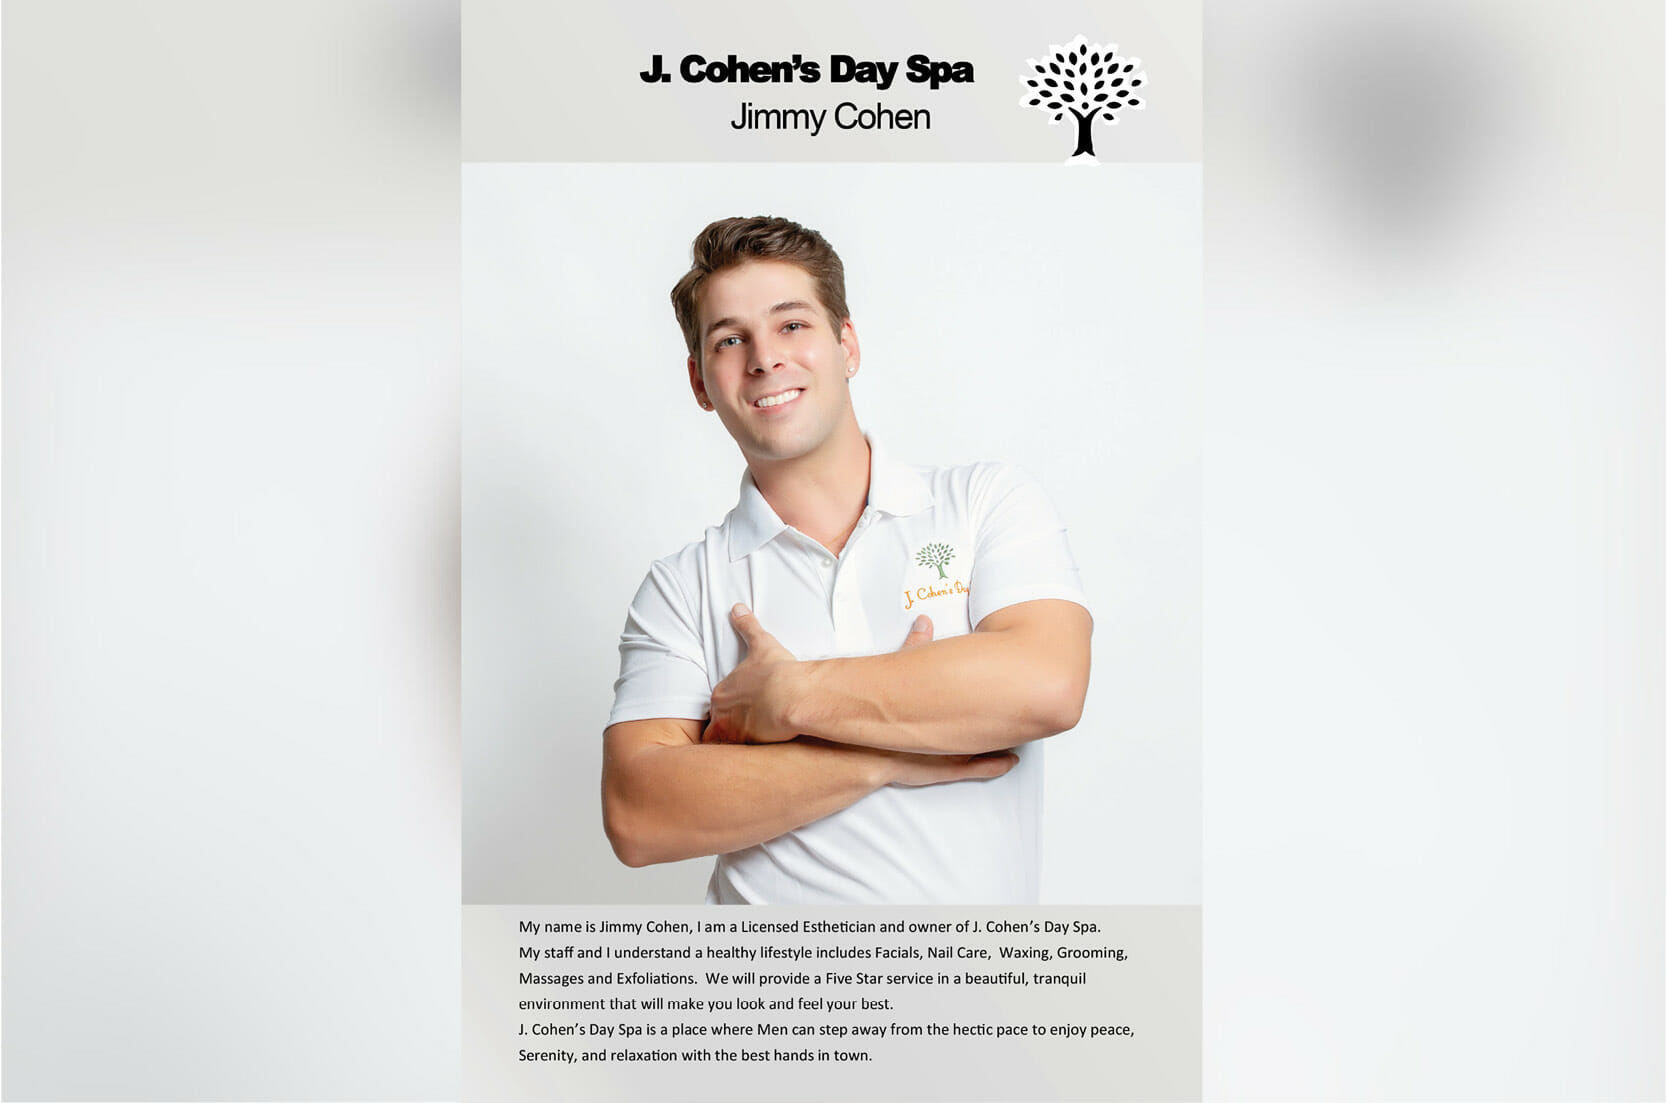 J. Cohen's Day Spa